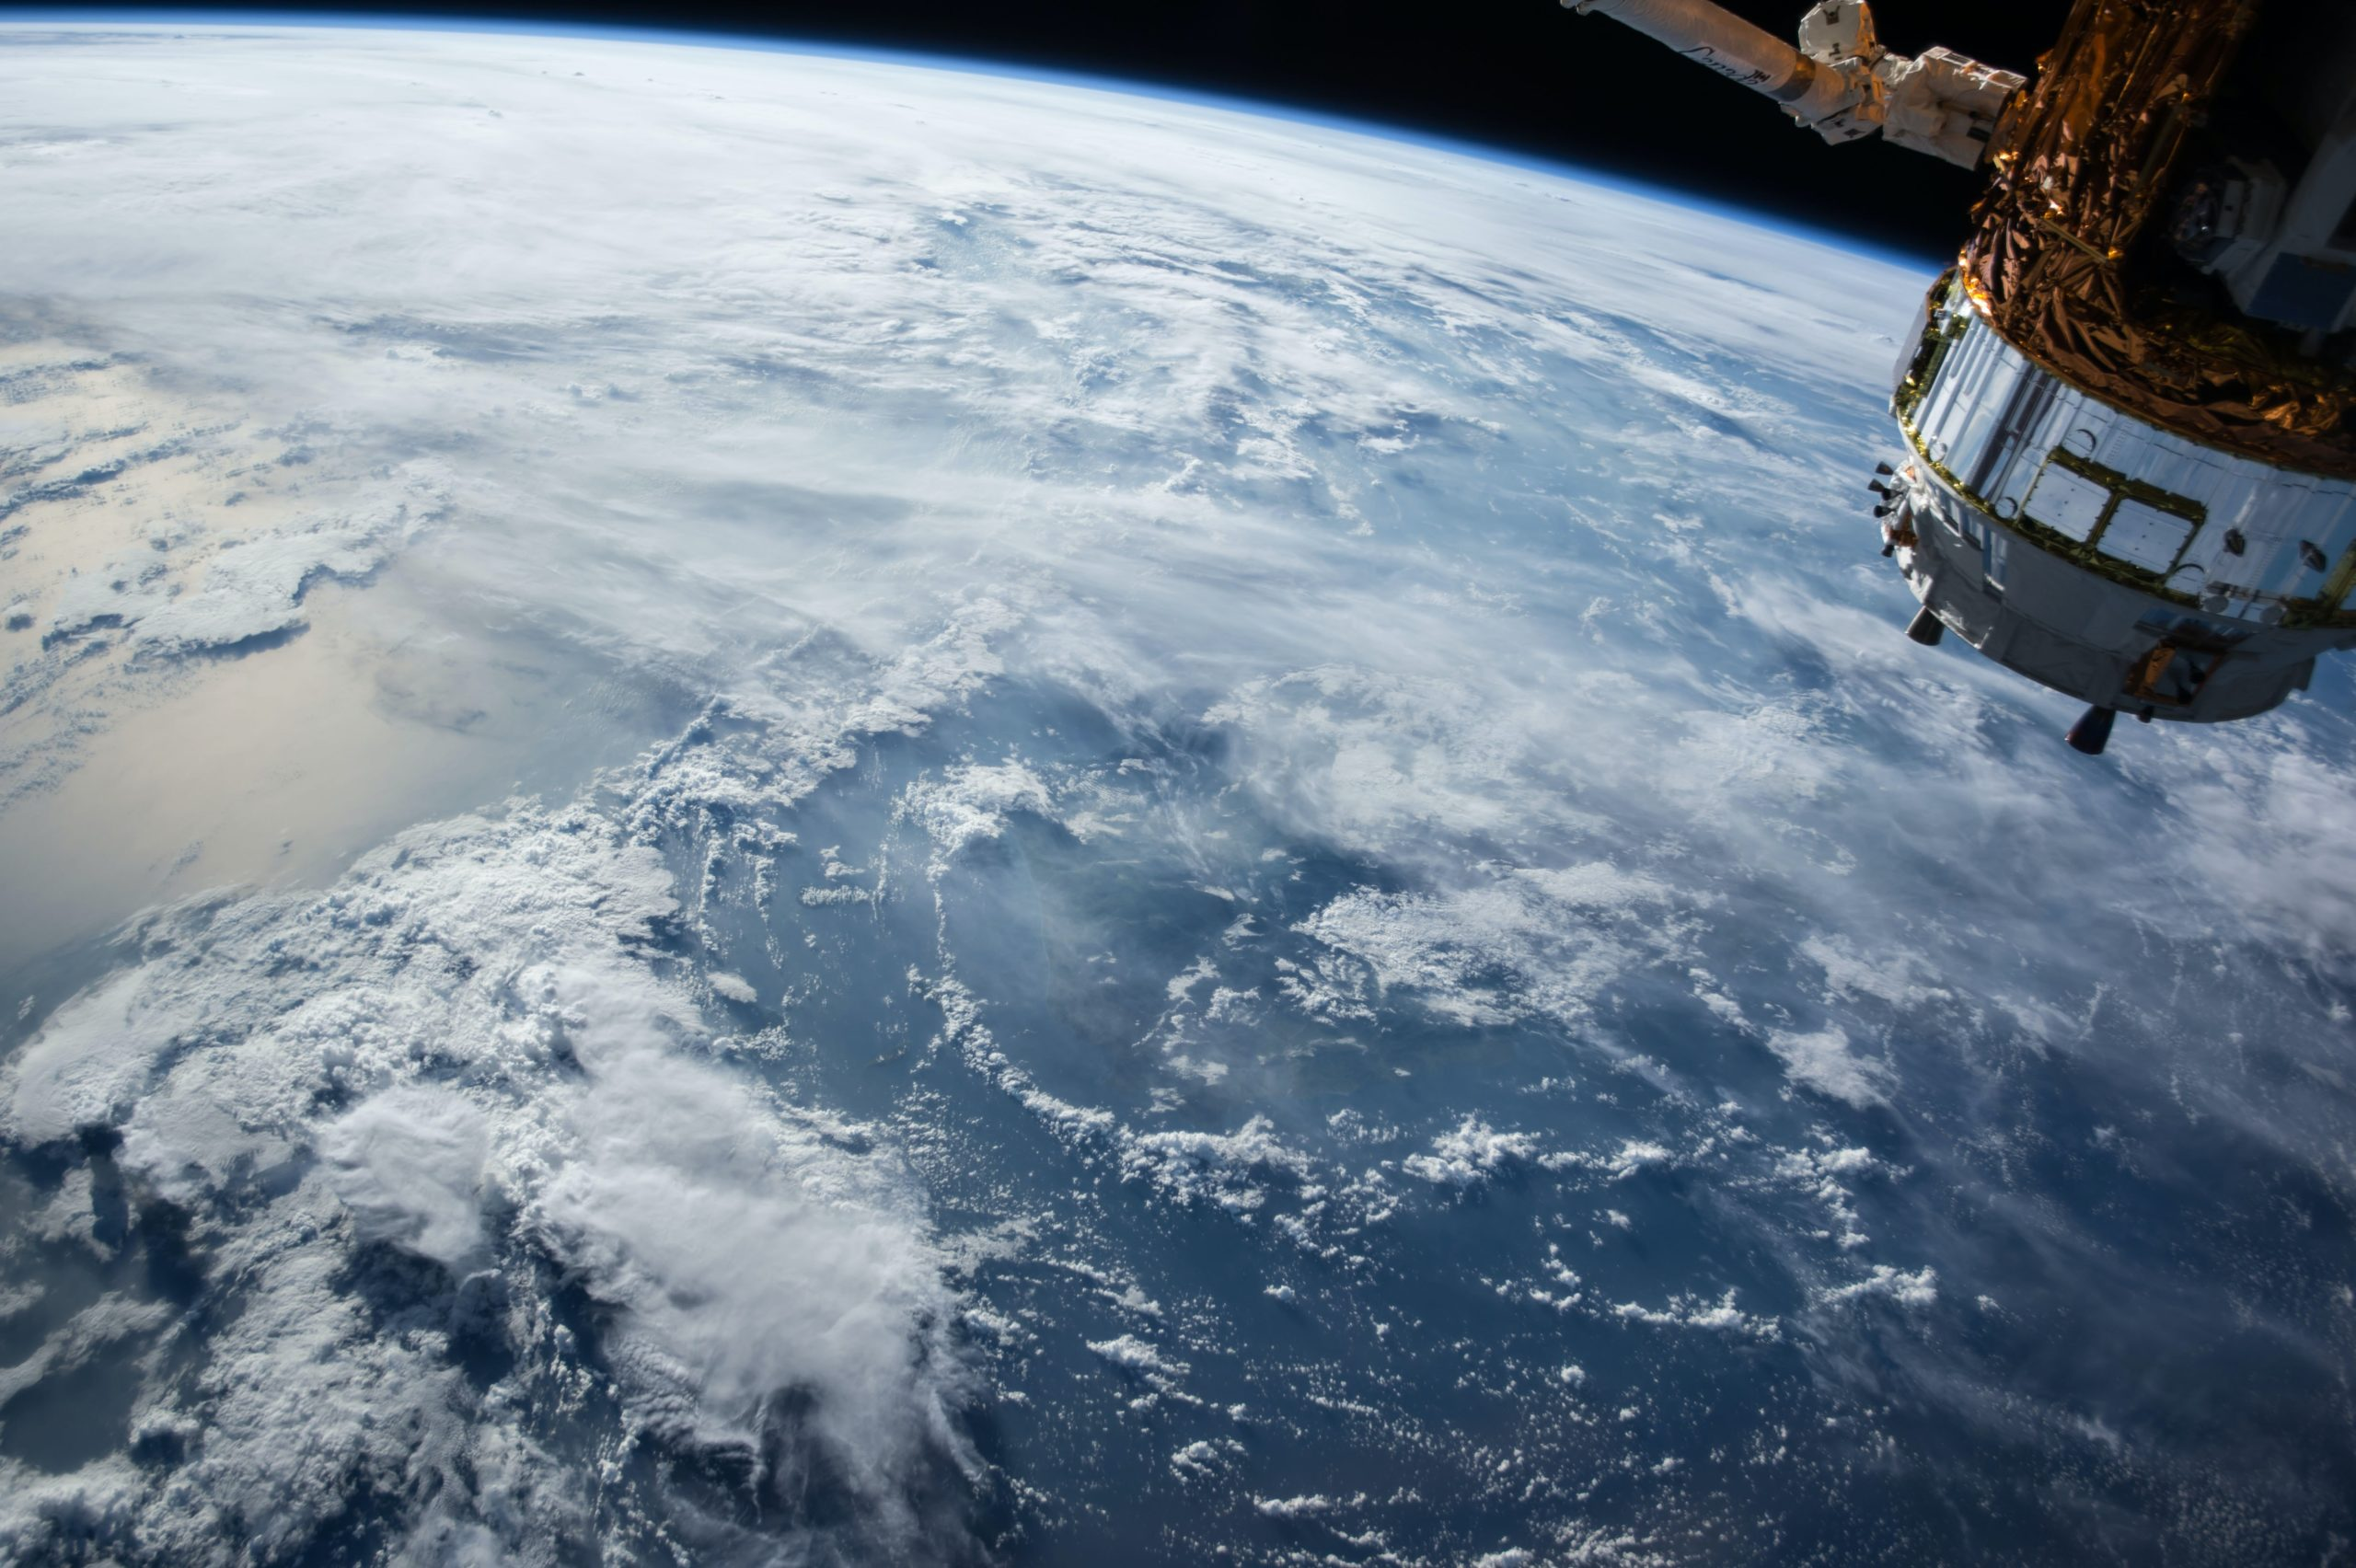 【Japanese Vocabulary】Space:宇宙(うちゅう)